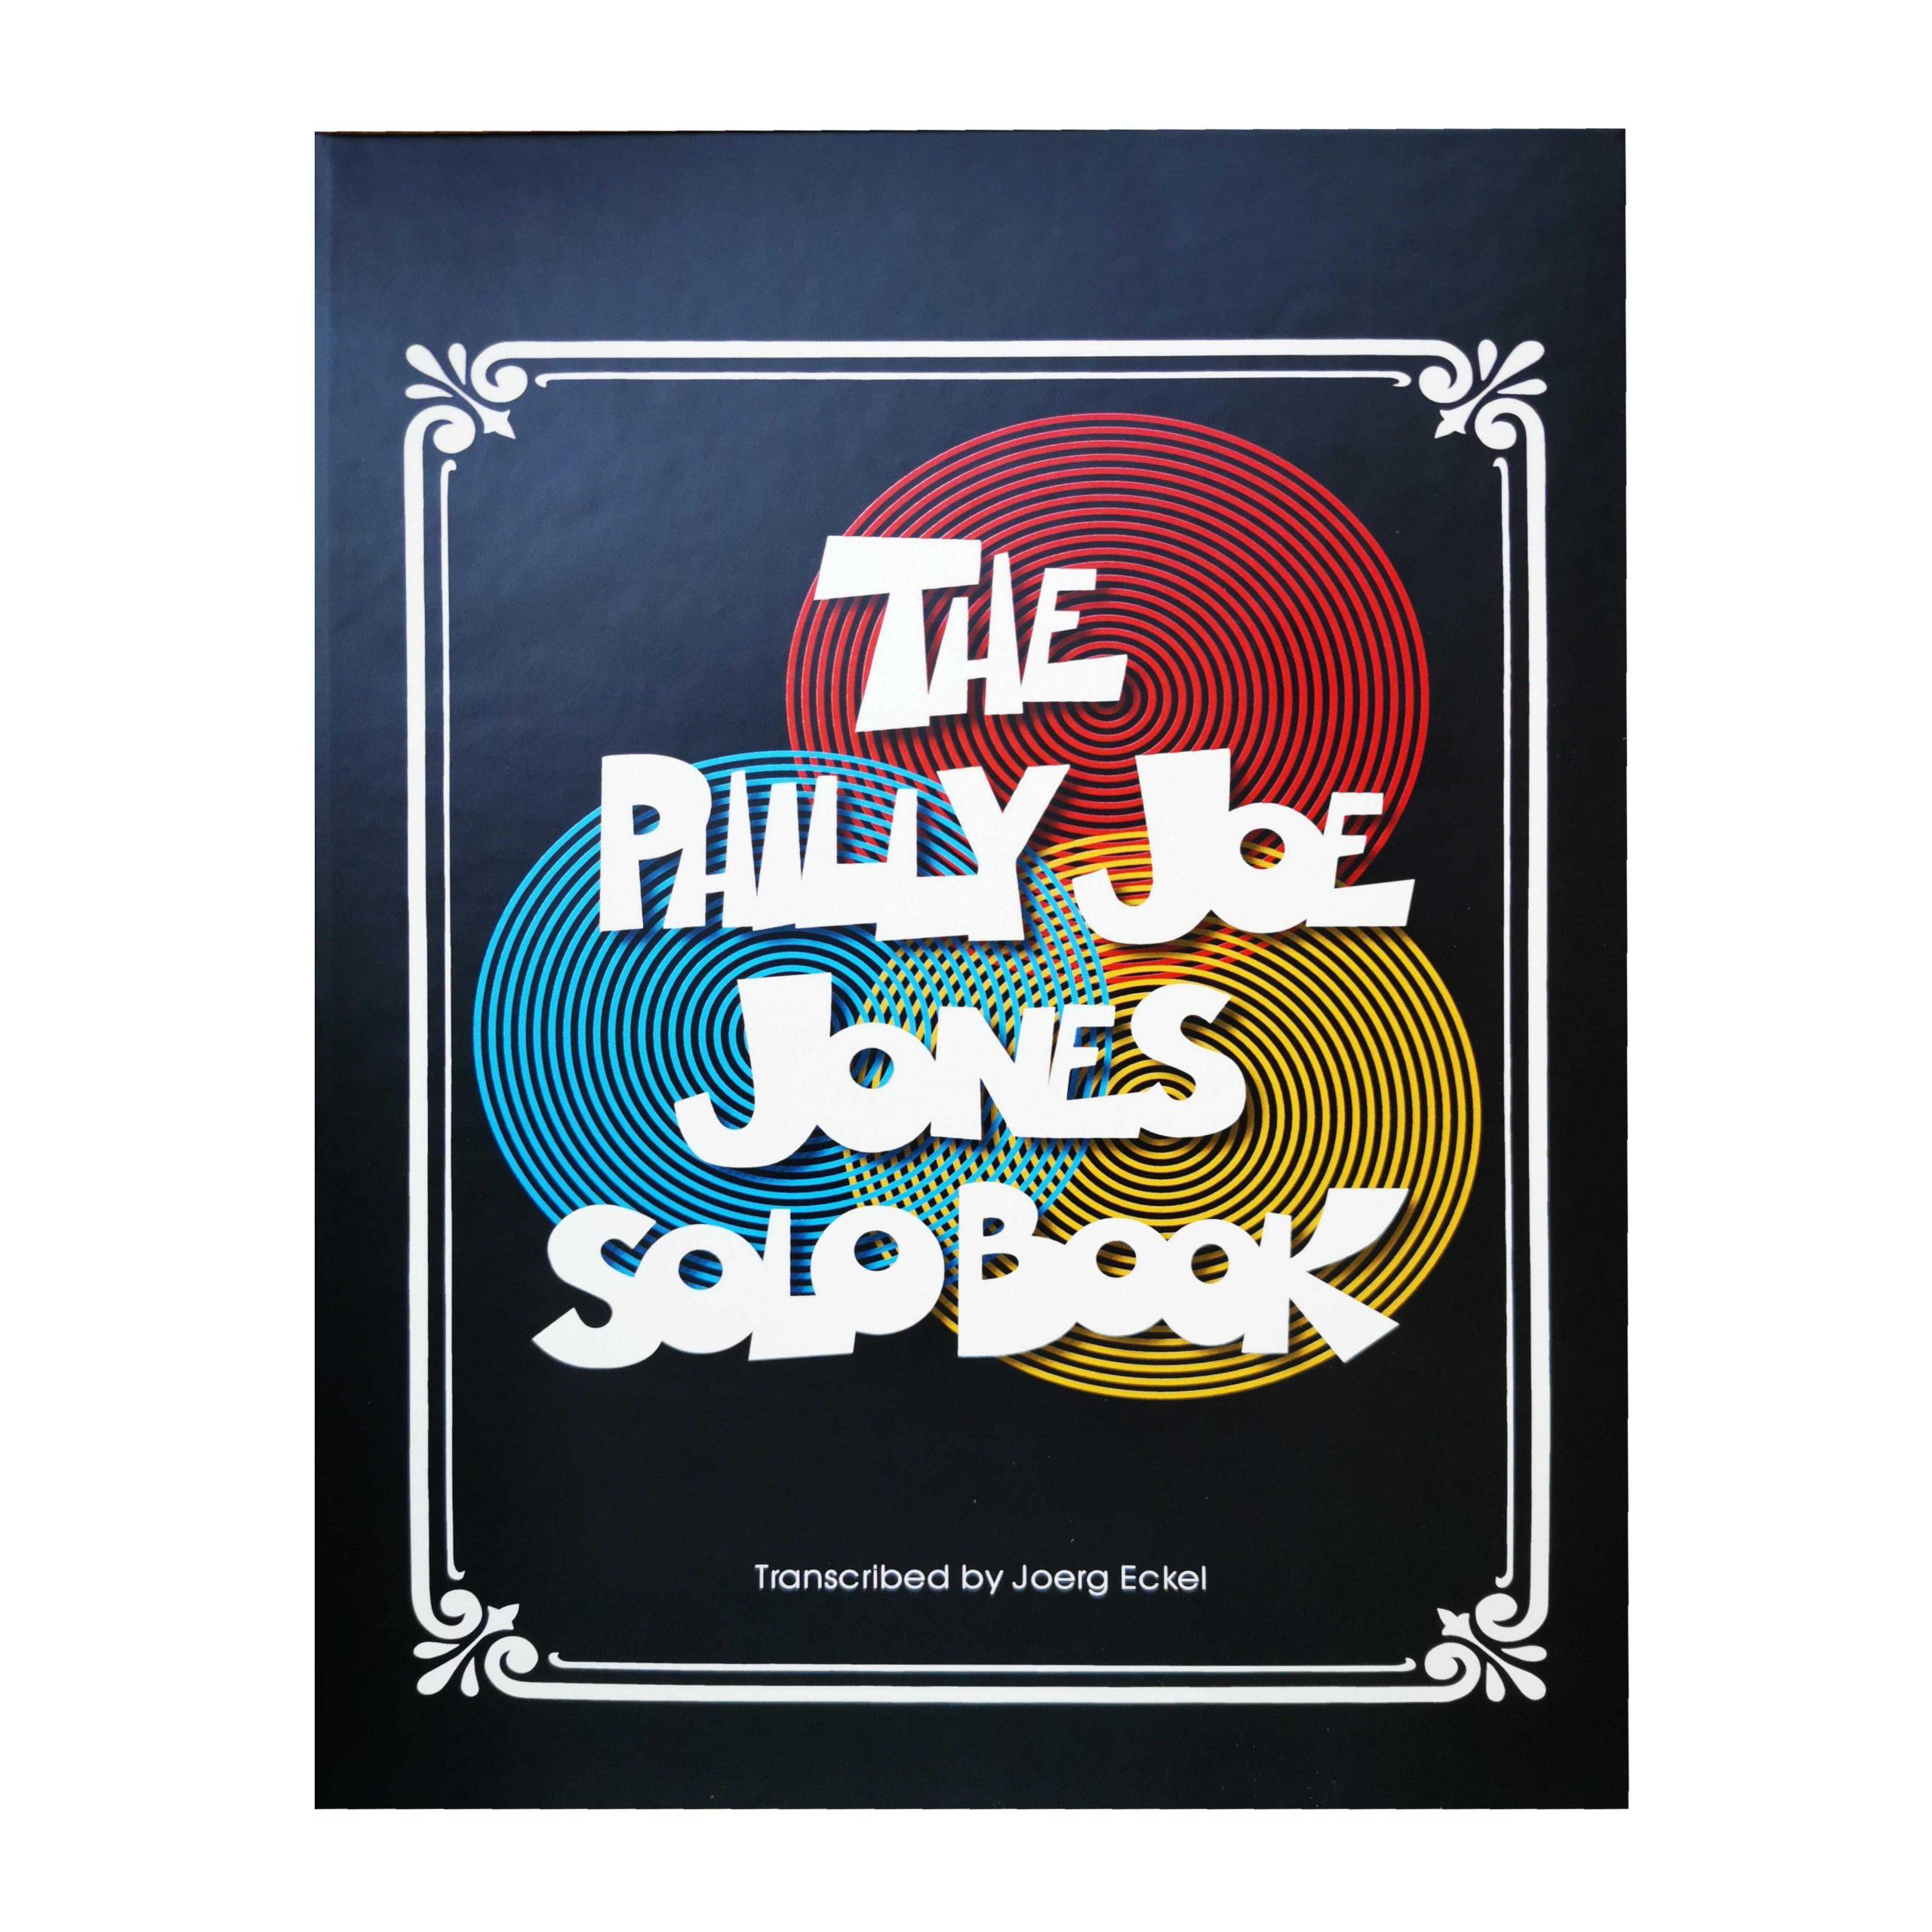 The Philly Joe Jones Solo Book by Joerg Eckel